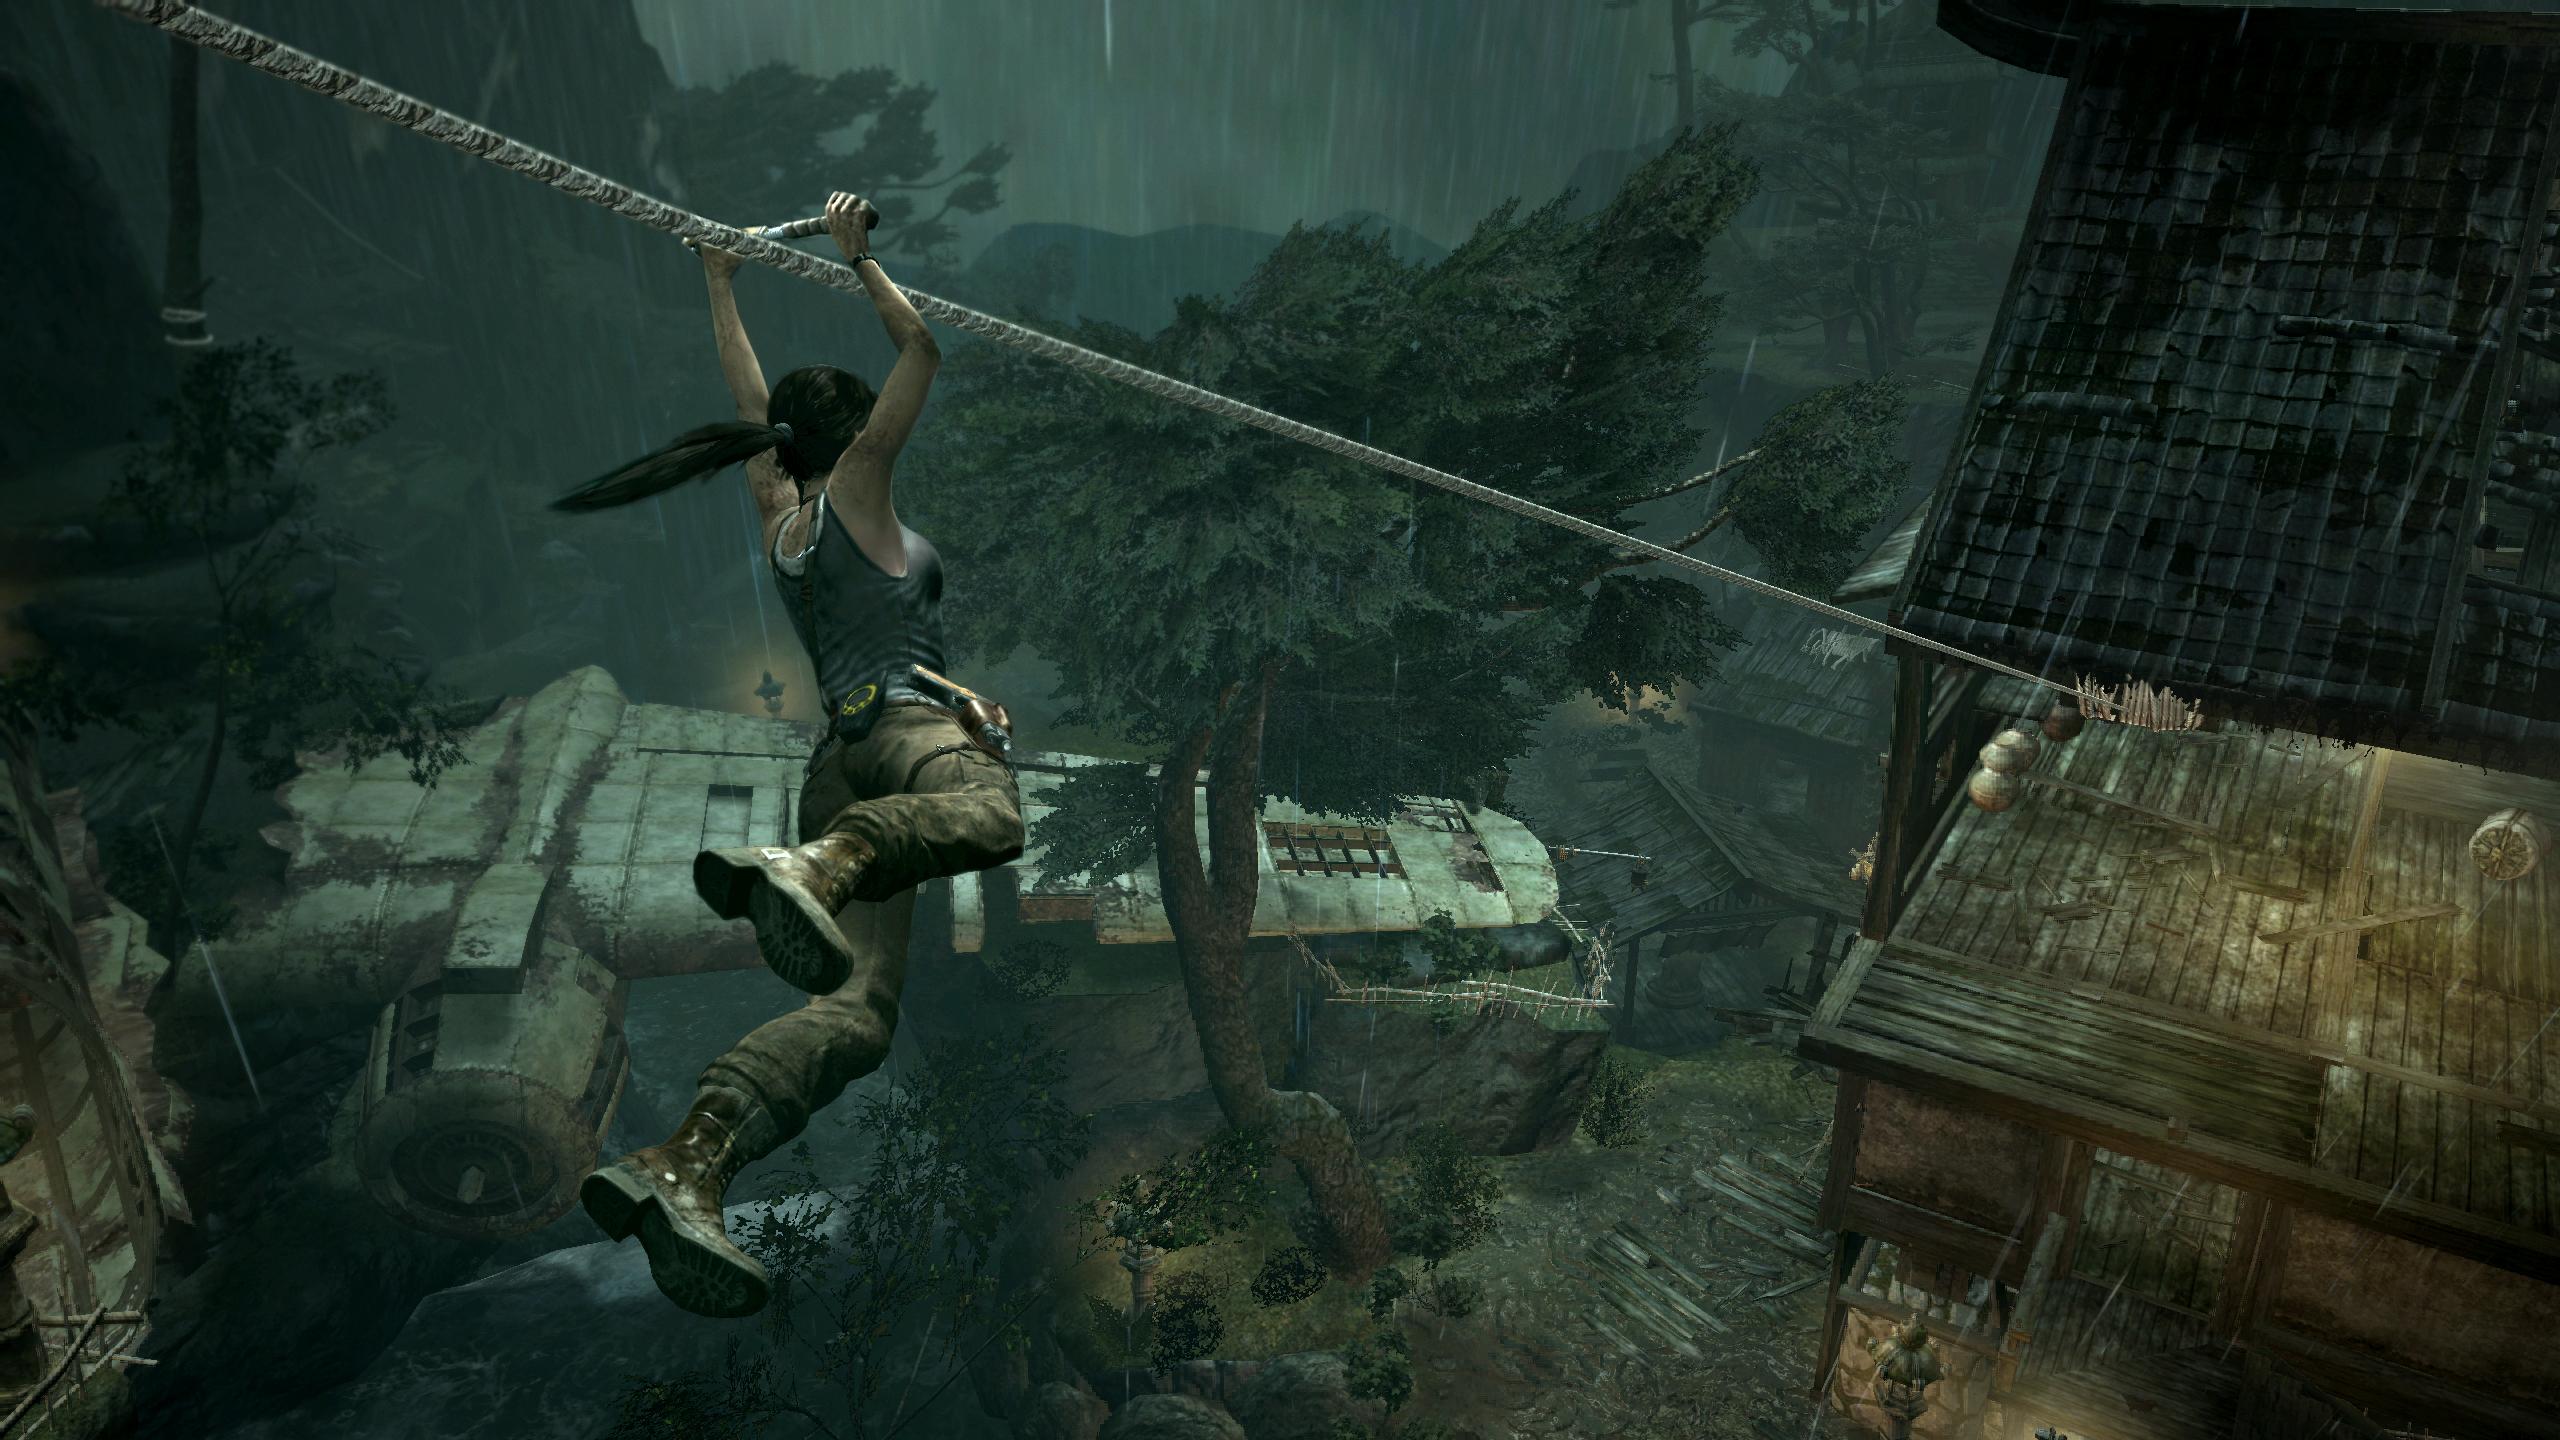 Tomb Raider (2013) - 10